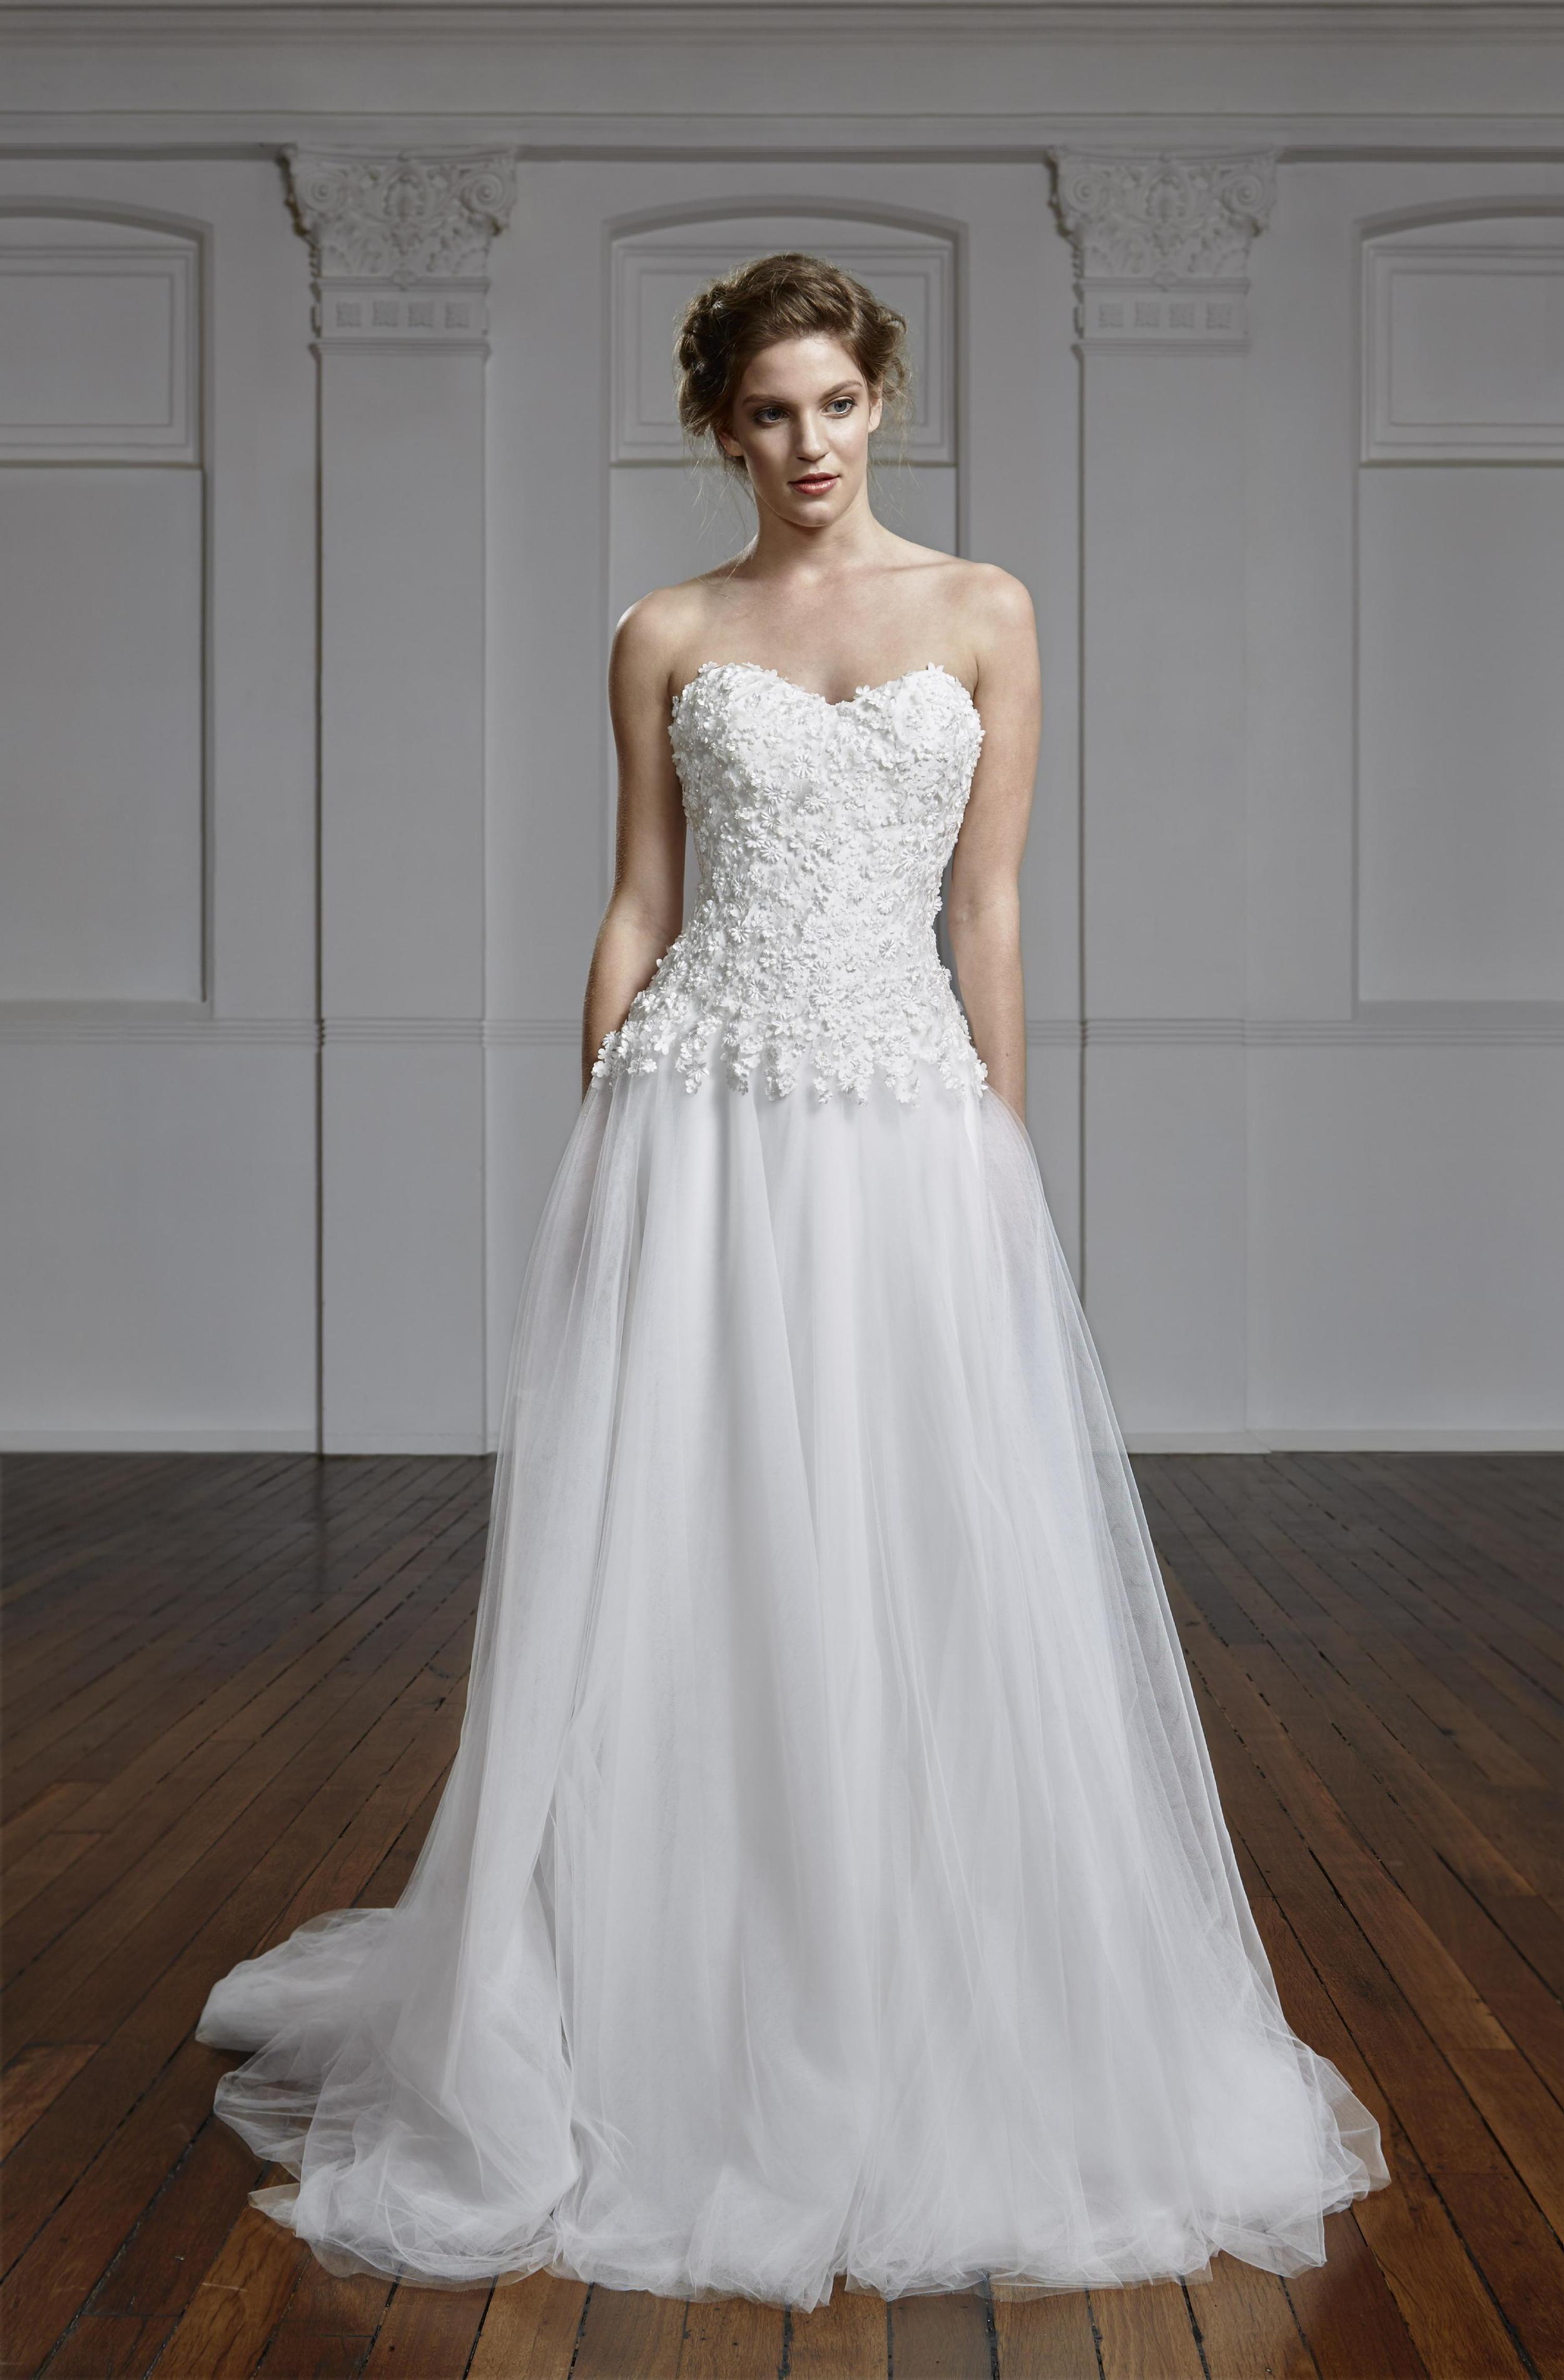 Wild Daisy-bridal design_TanyaAnic©GrantSparkesCarroll_195 a.jpg